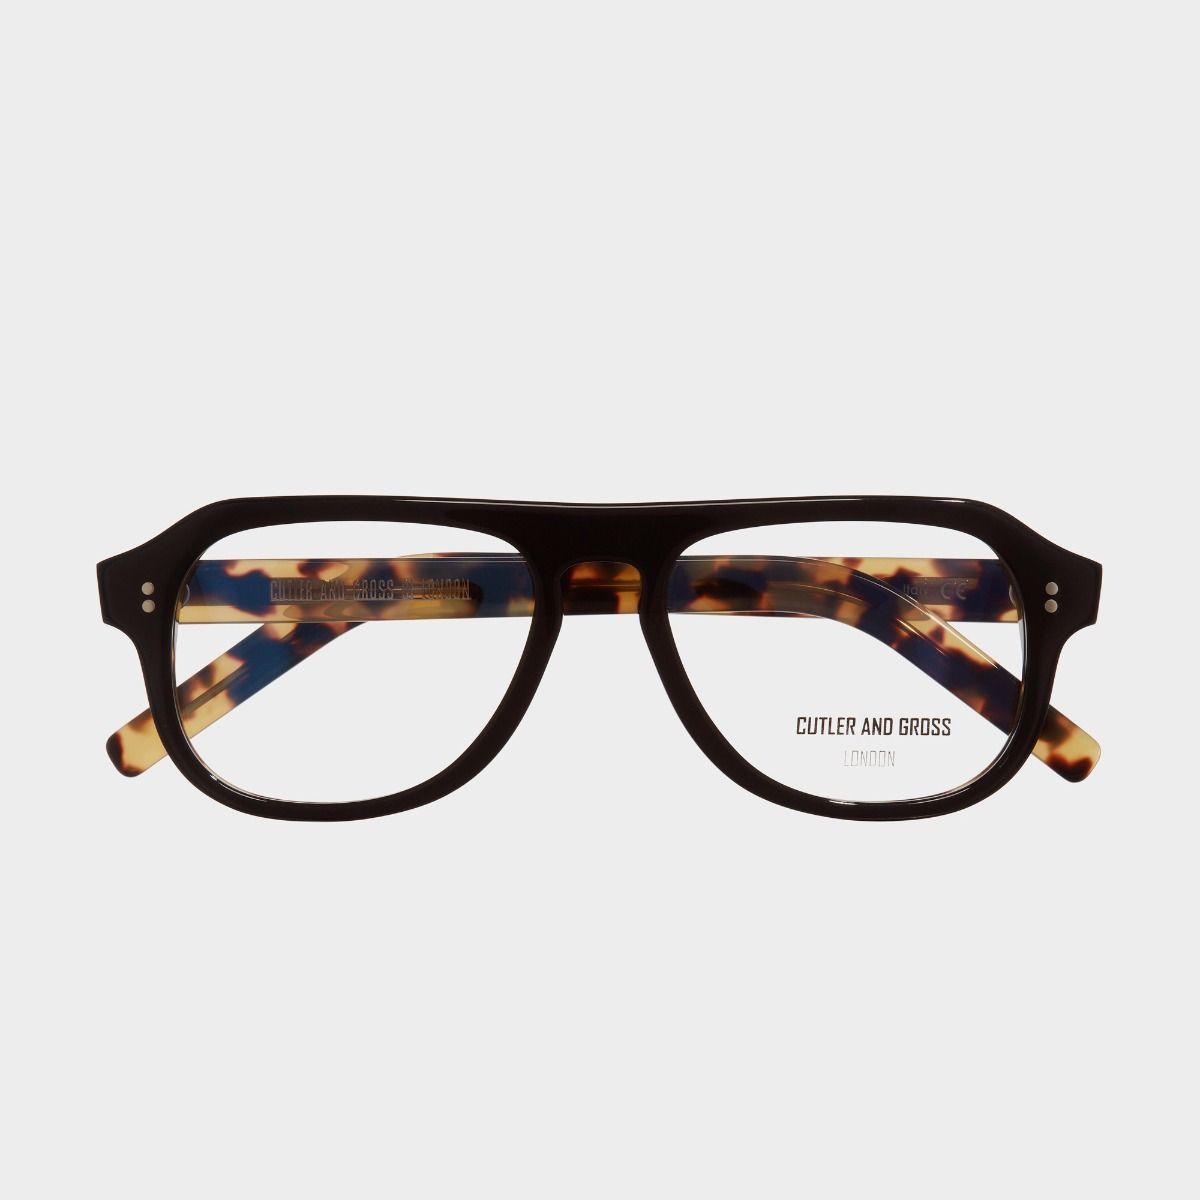 0822V2 Optical Aviator Glasses-Black on Camo